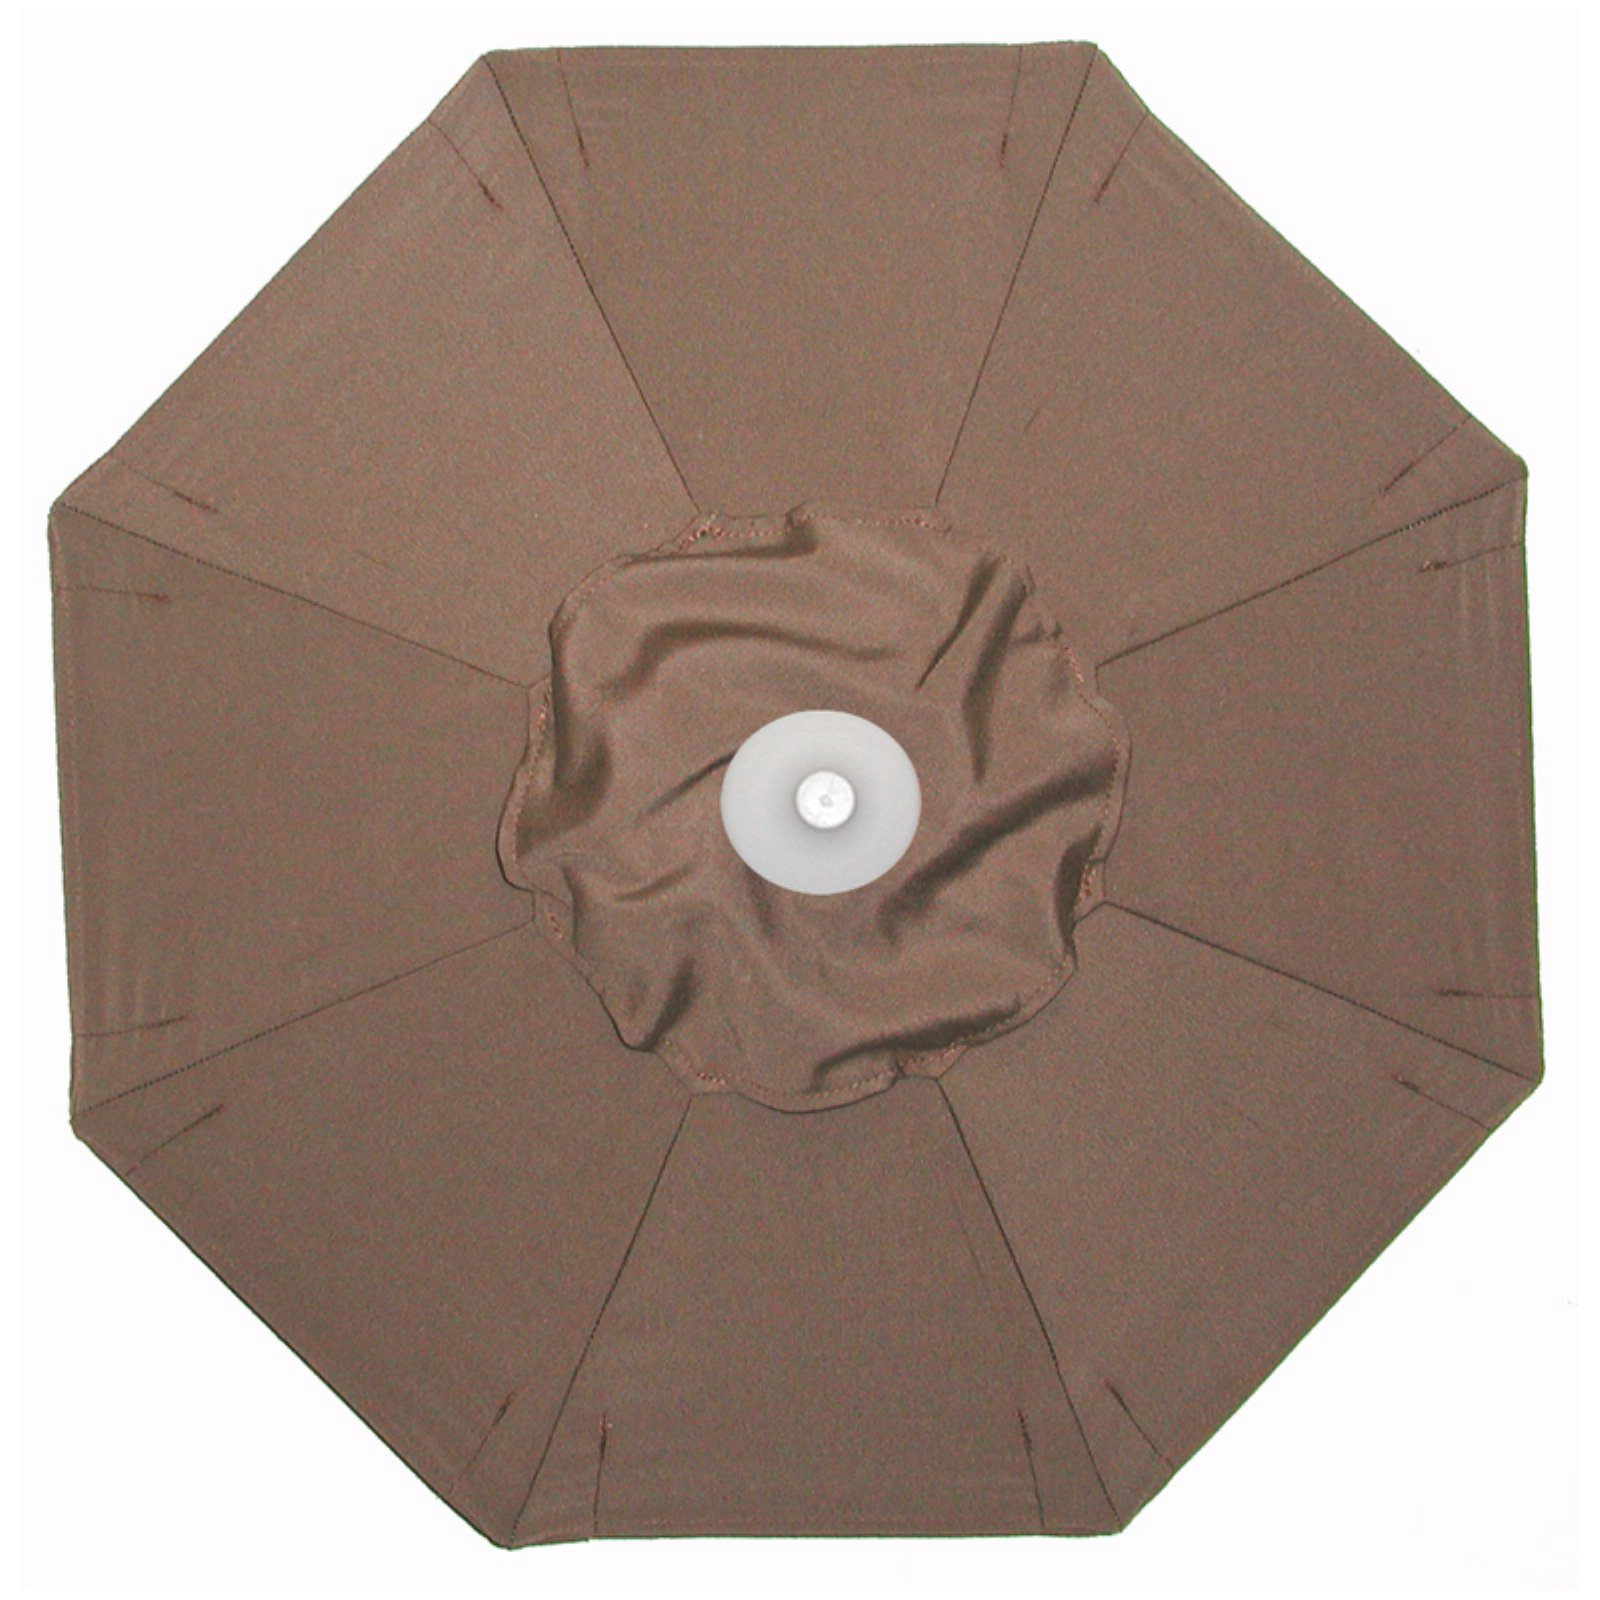 Galtech Classic 9-ft. Wood Market Umbrella